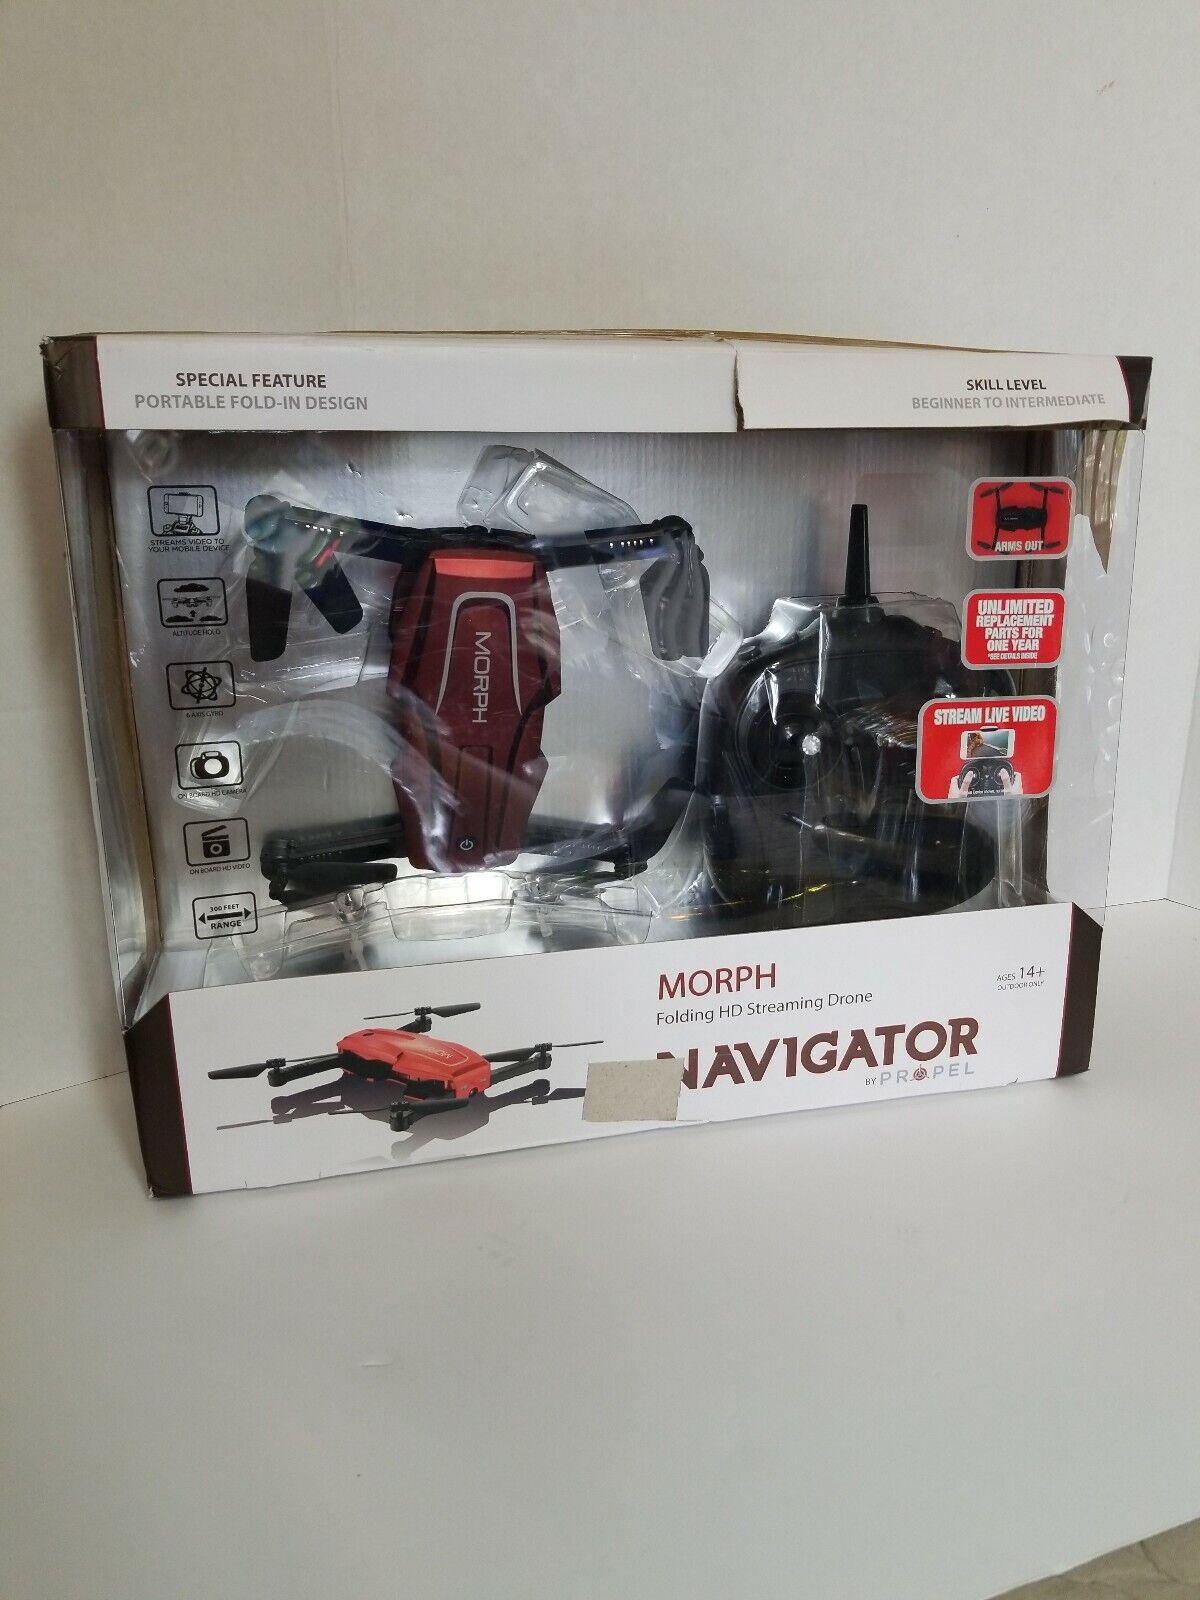 Propel Navigator Morph Plegable HD streaming Drone S Rojo ventas por menor